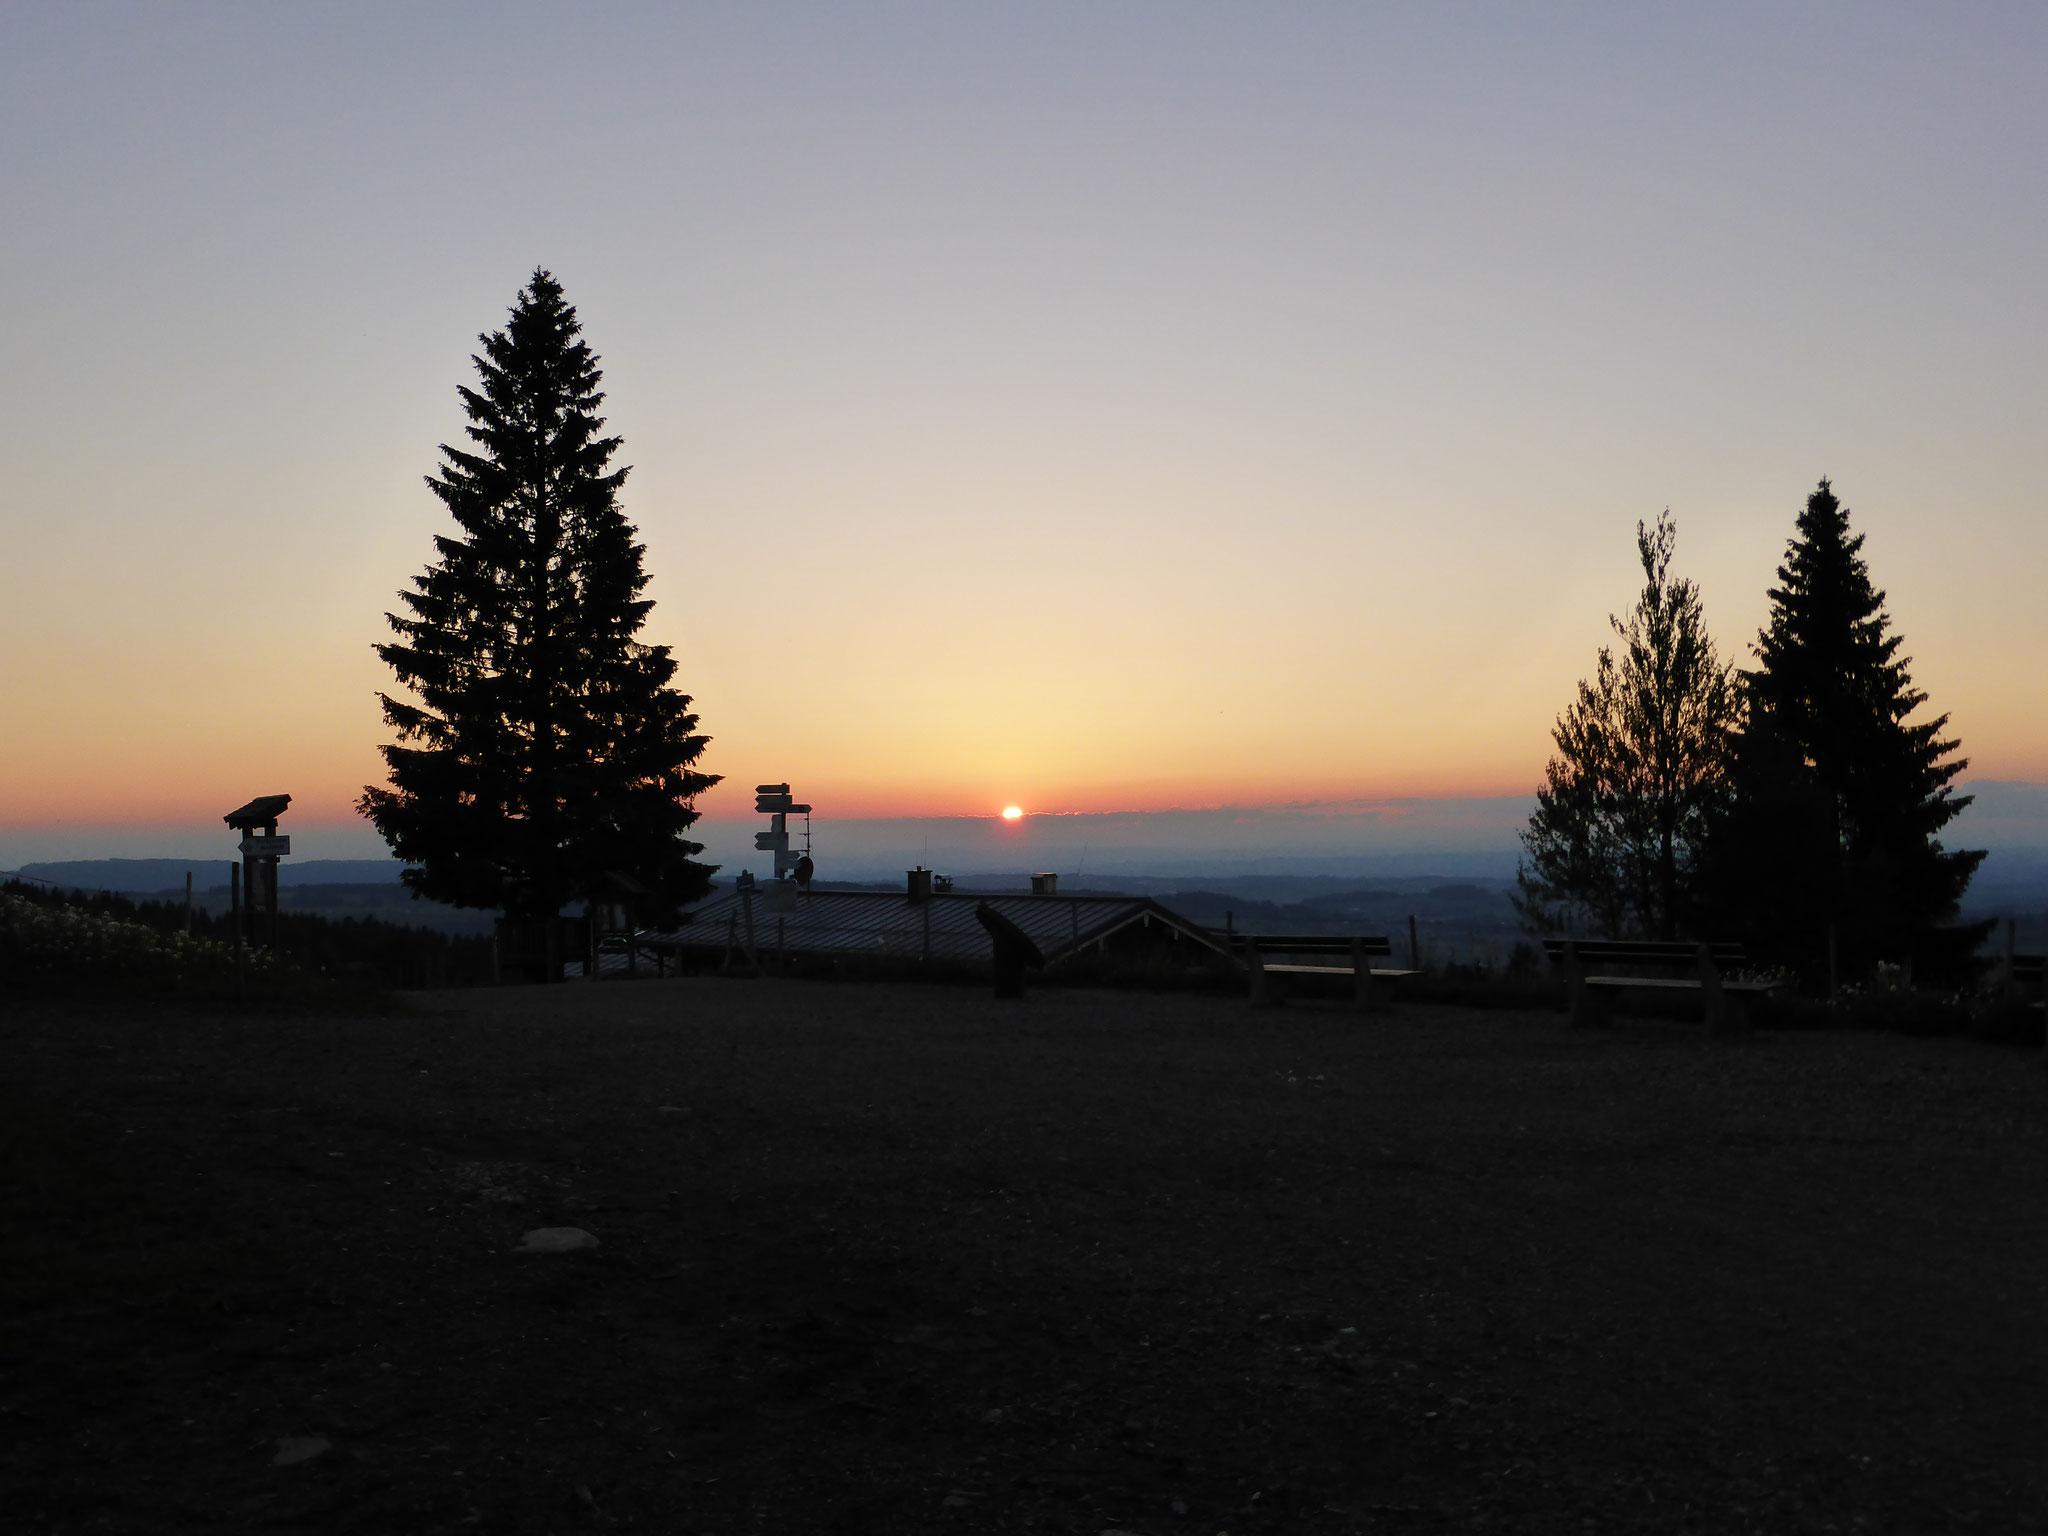 Sonnenuntergang auf dem Imberg